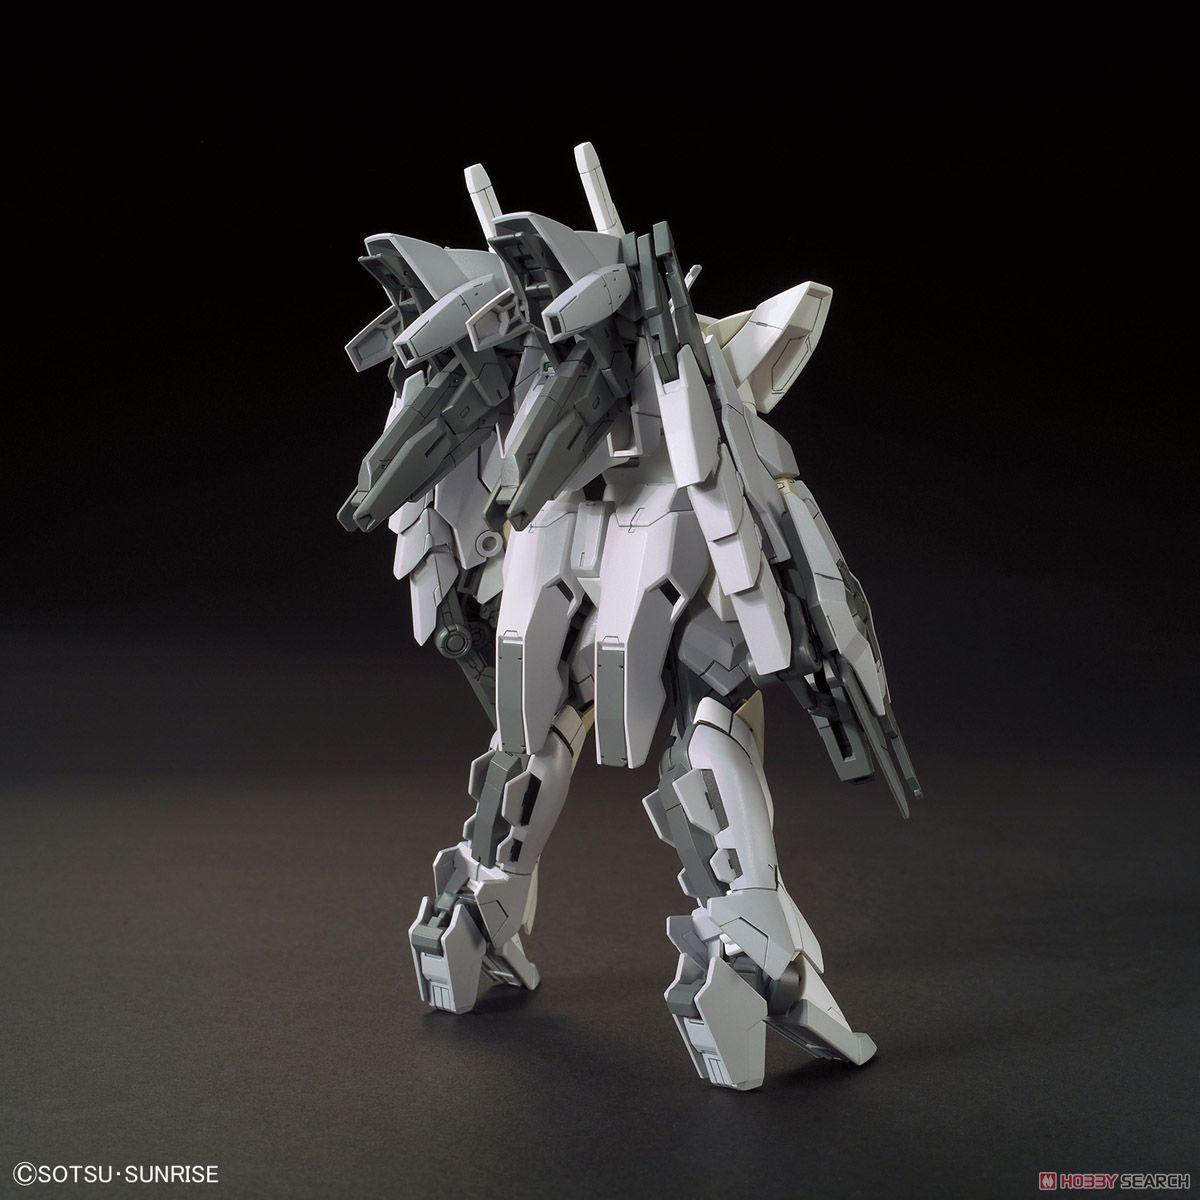 Reversible Gundam (HGBF) (Gundam Model Kits) Item picture4